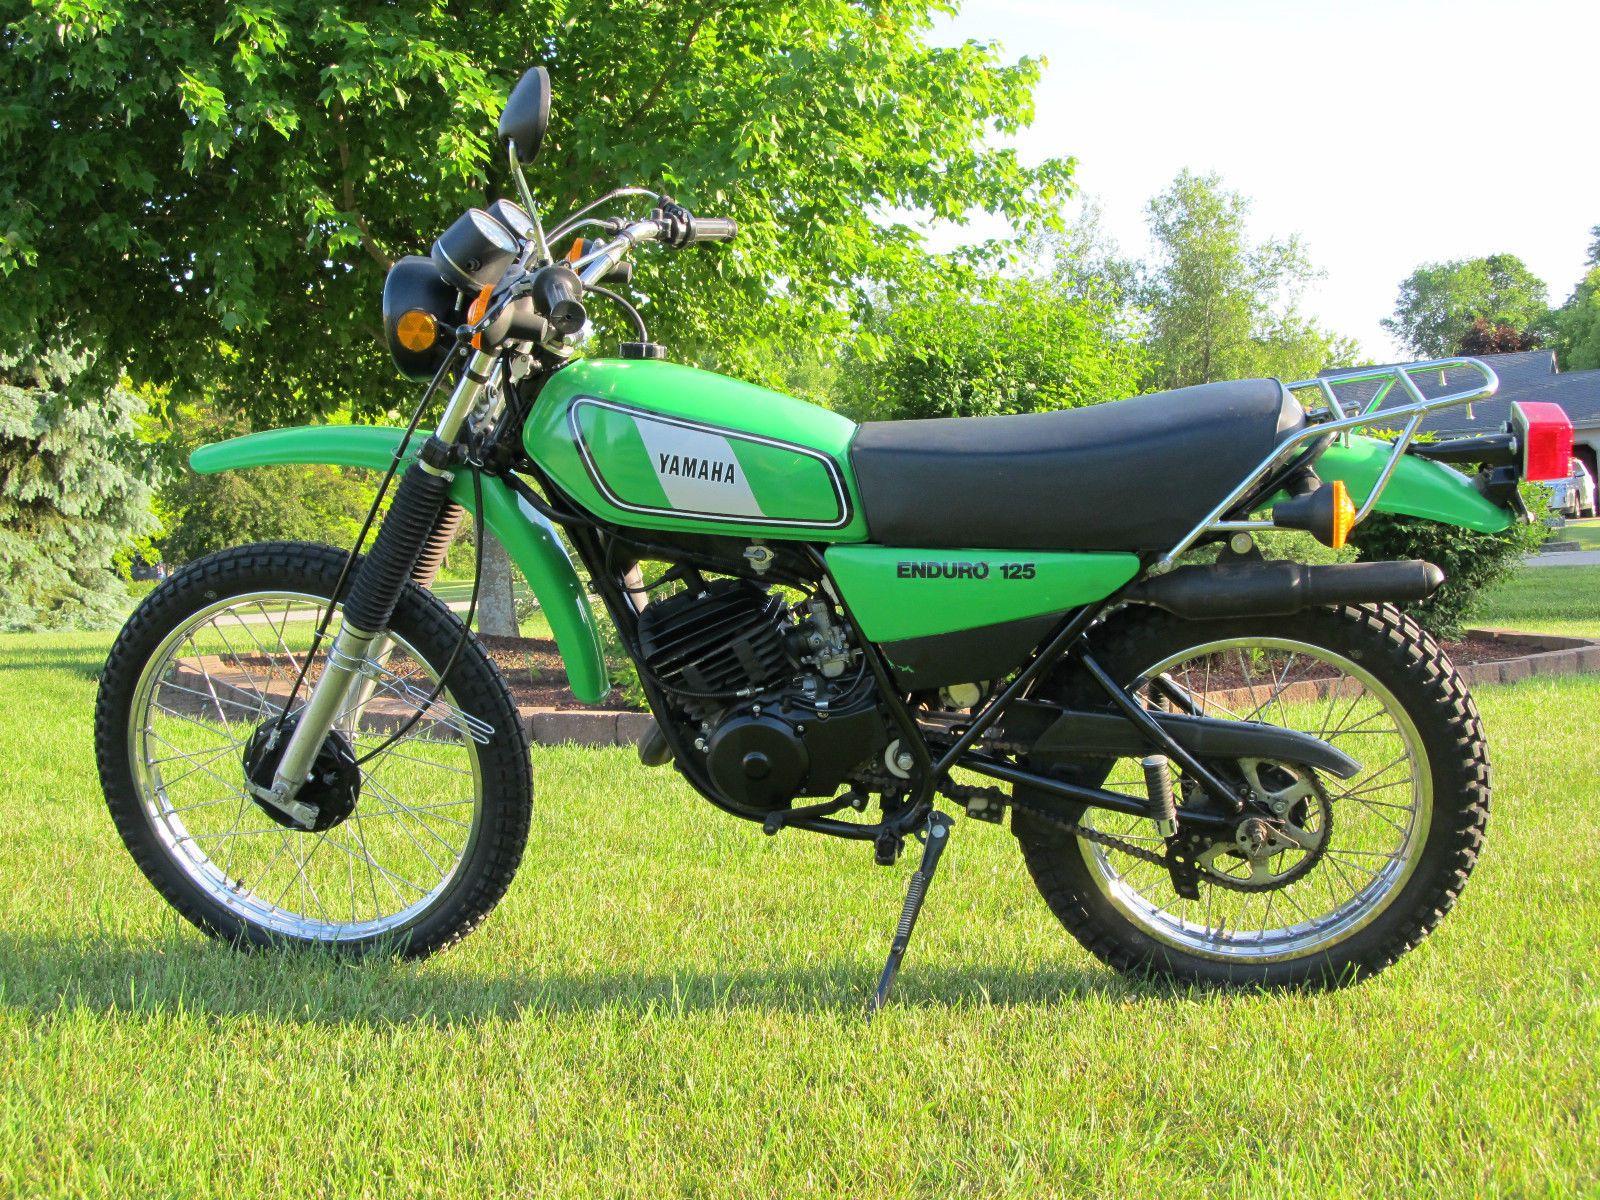 Yamaha dt 125 ebay and dirt biking yamaha dt 125 ebay publicscrutiny Choice Image